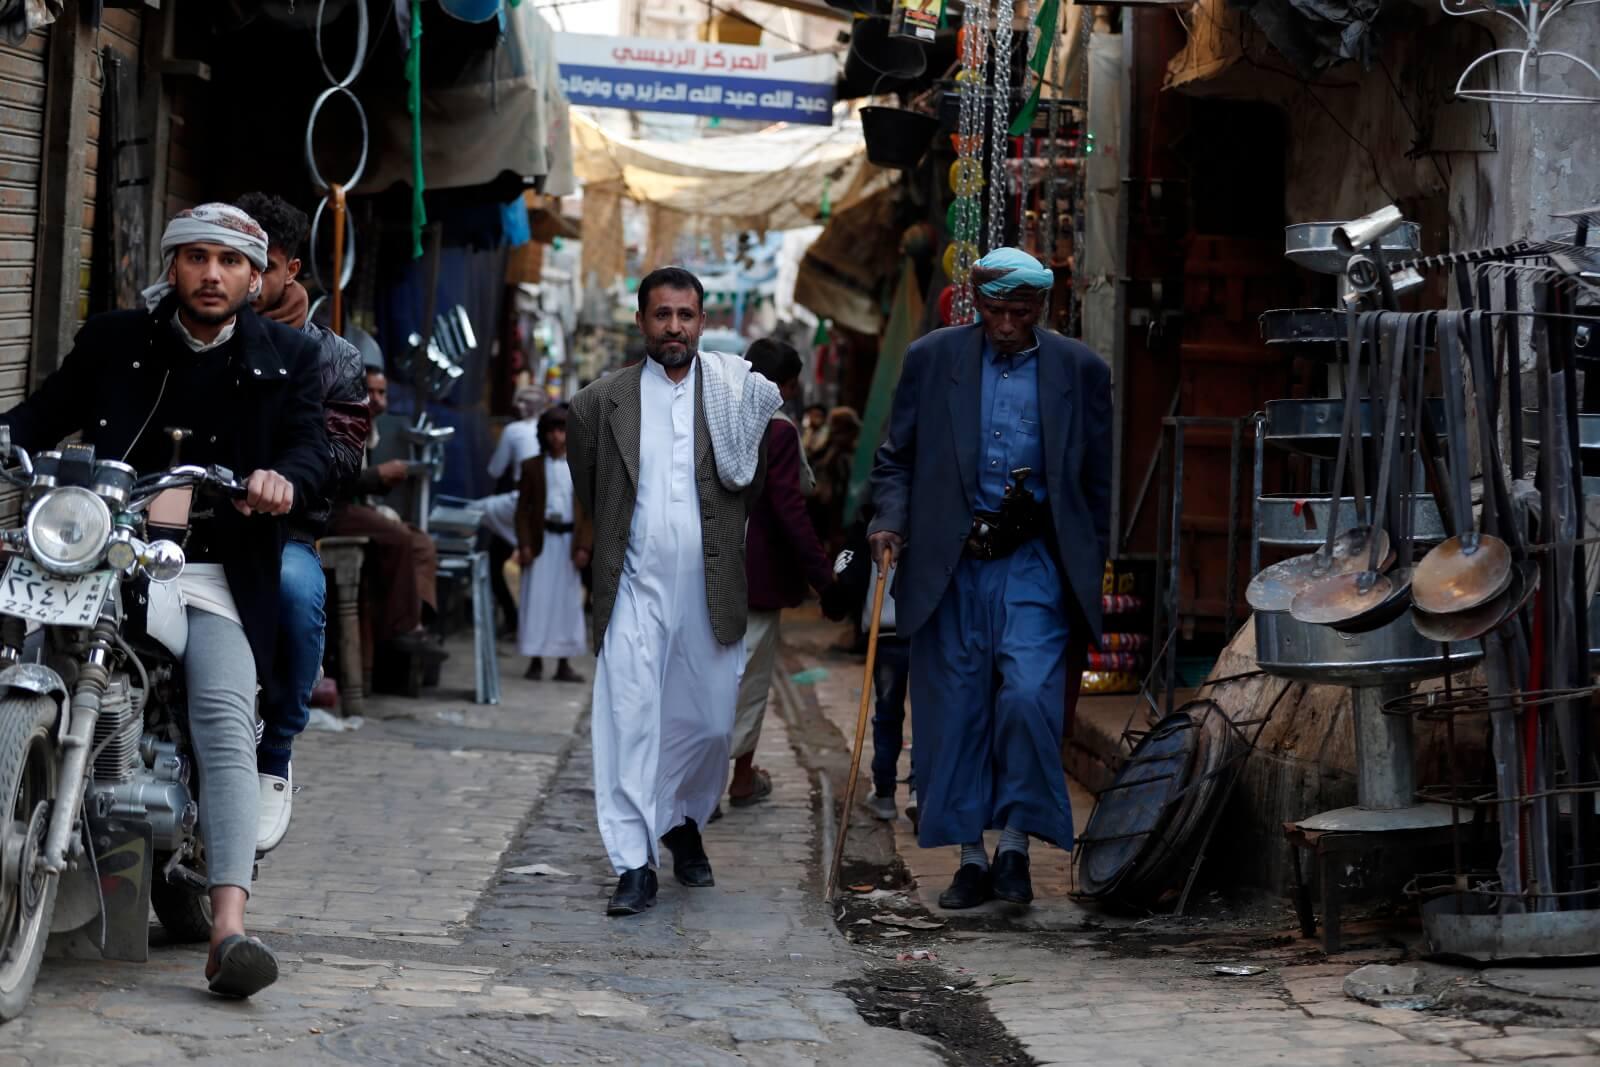 Jemen ciągle pod napięciem fot. EPA/YAHYA ARHAB